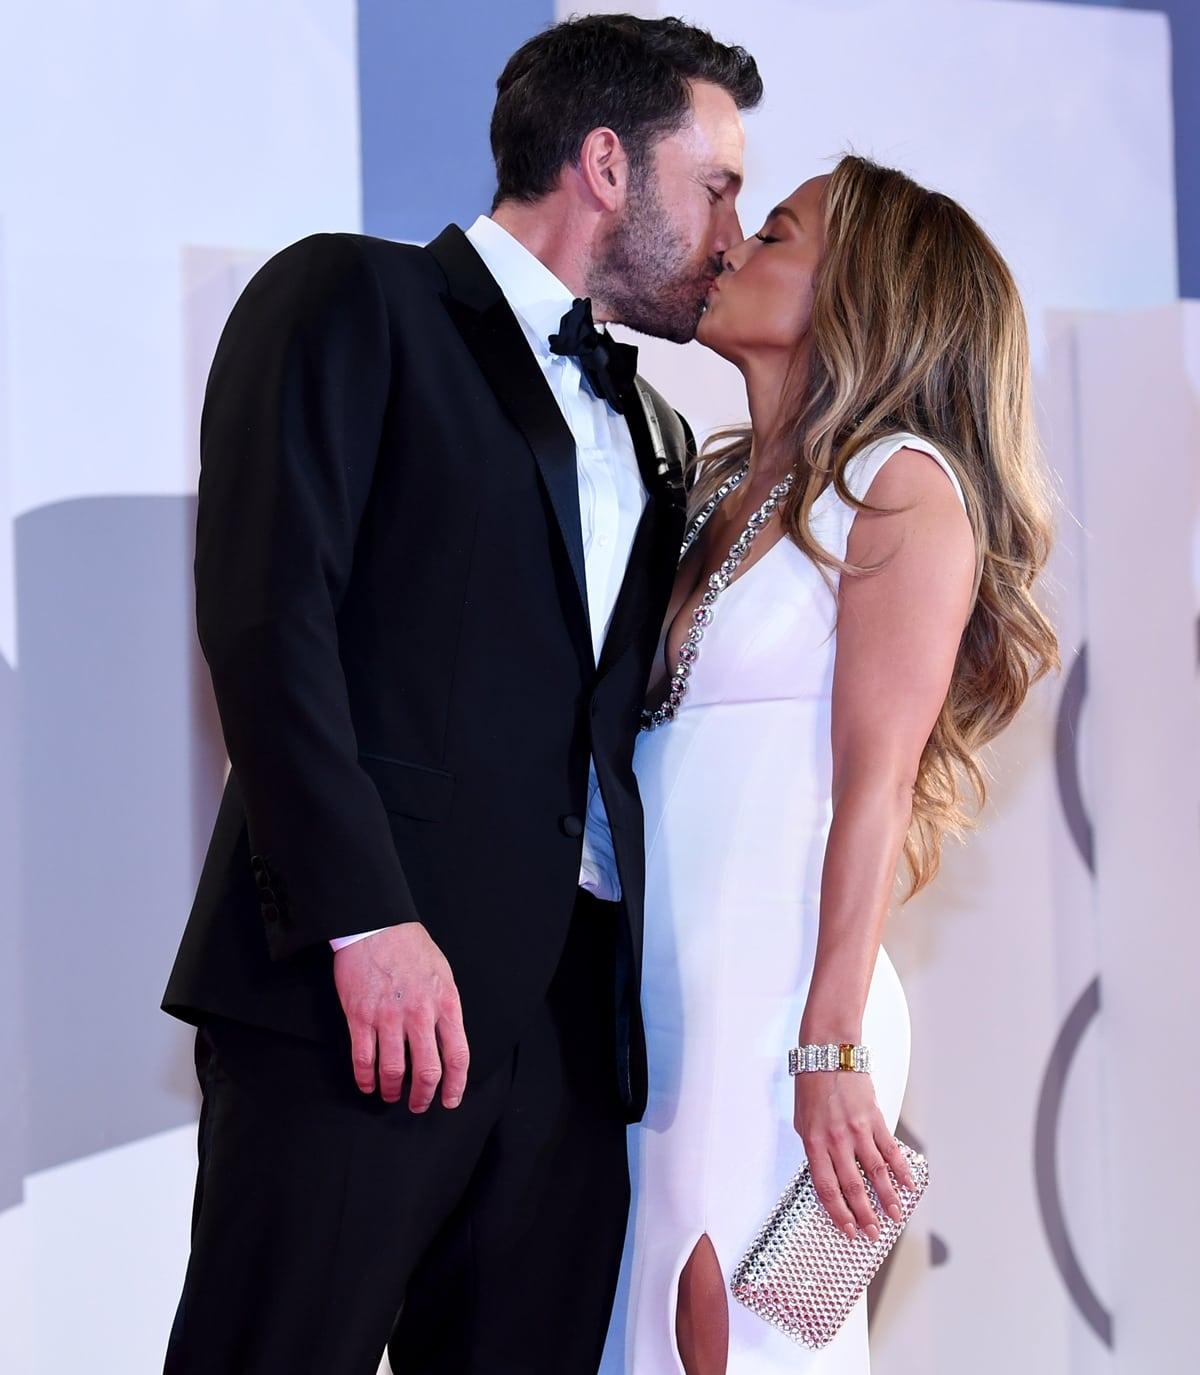 Jennifer Lopez kisses her boyfriend Ben Affleck during the 2021 Venice Film Festival